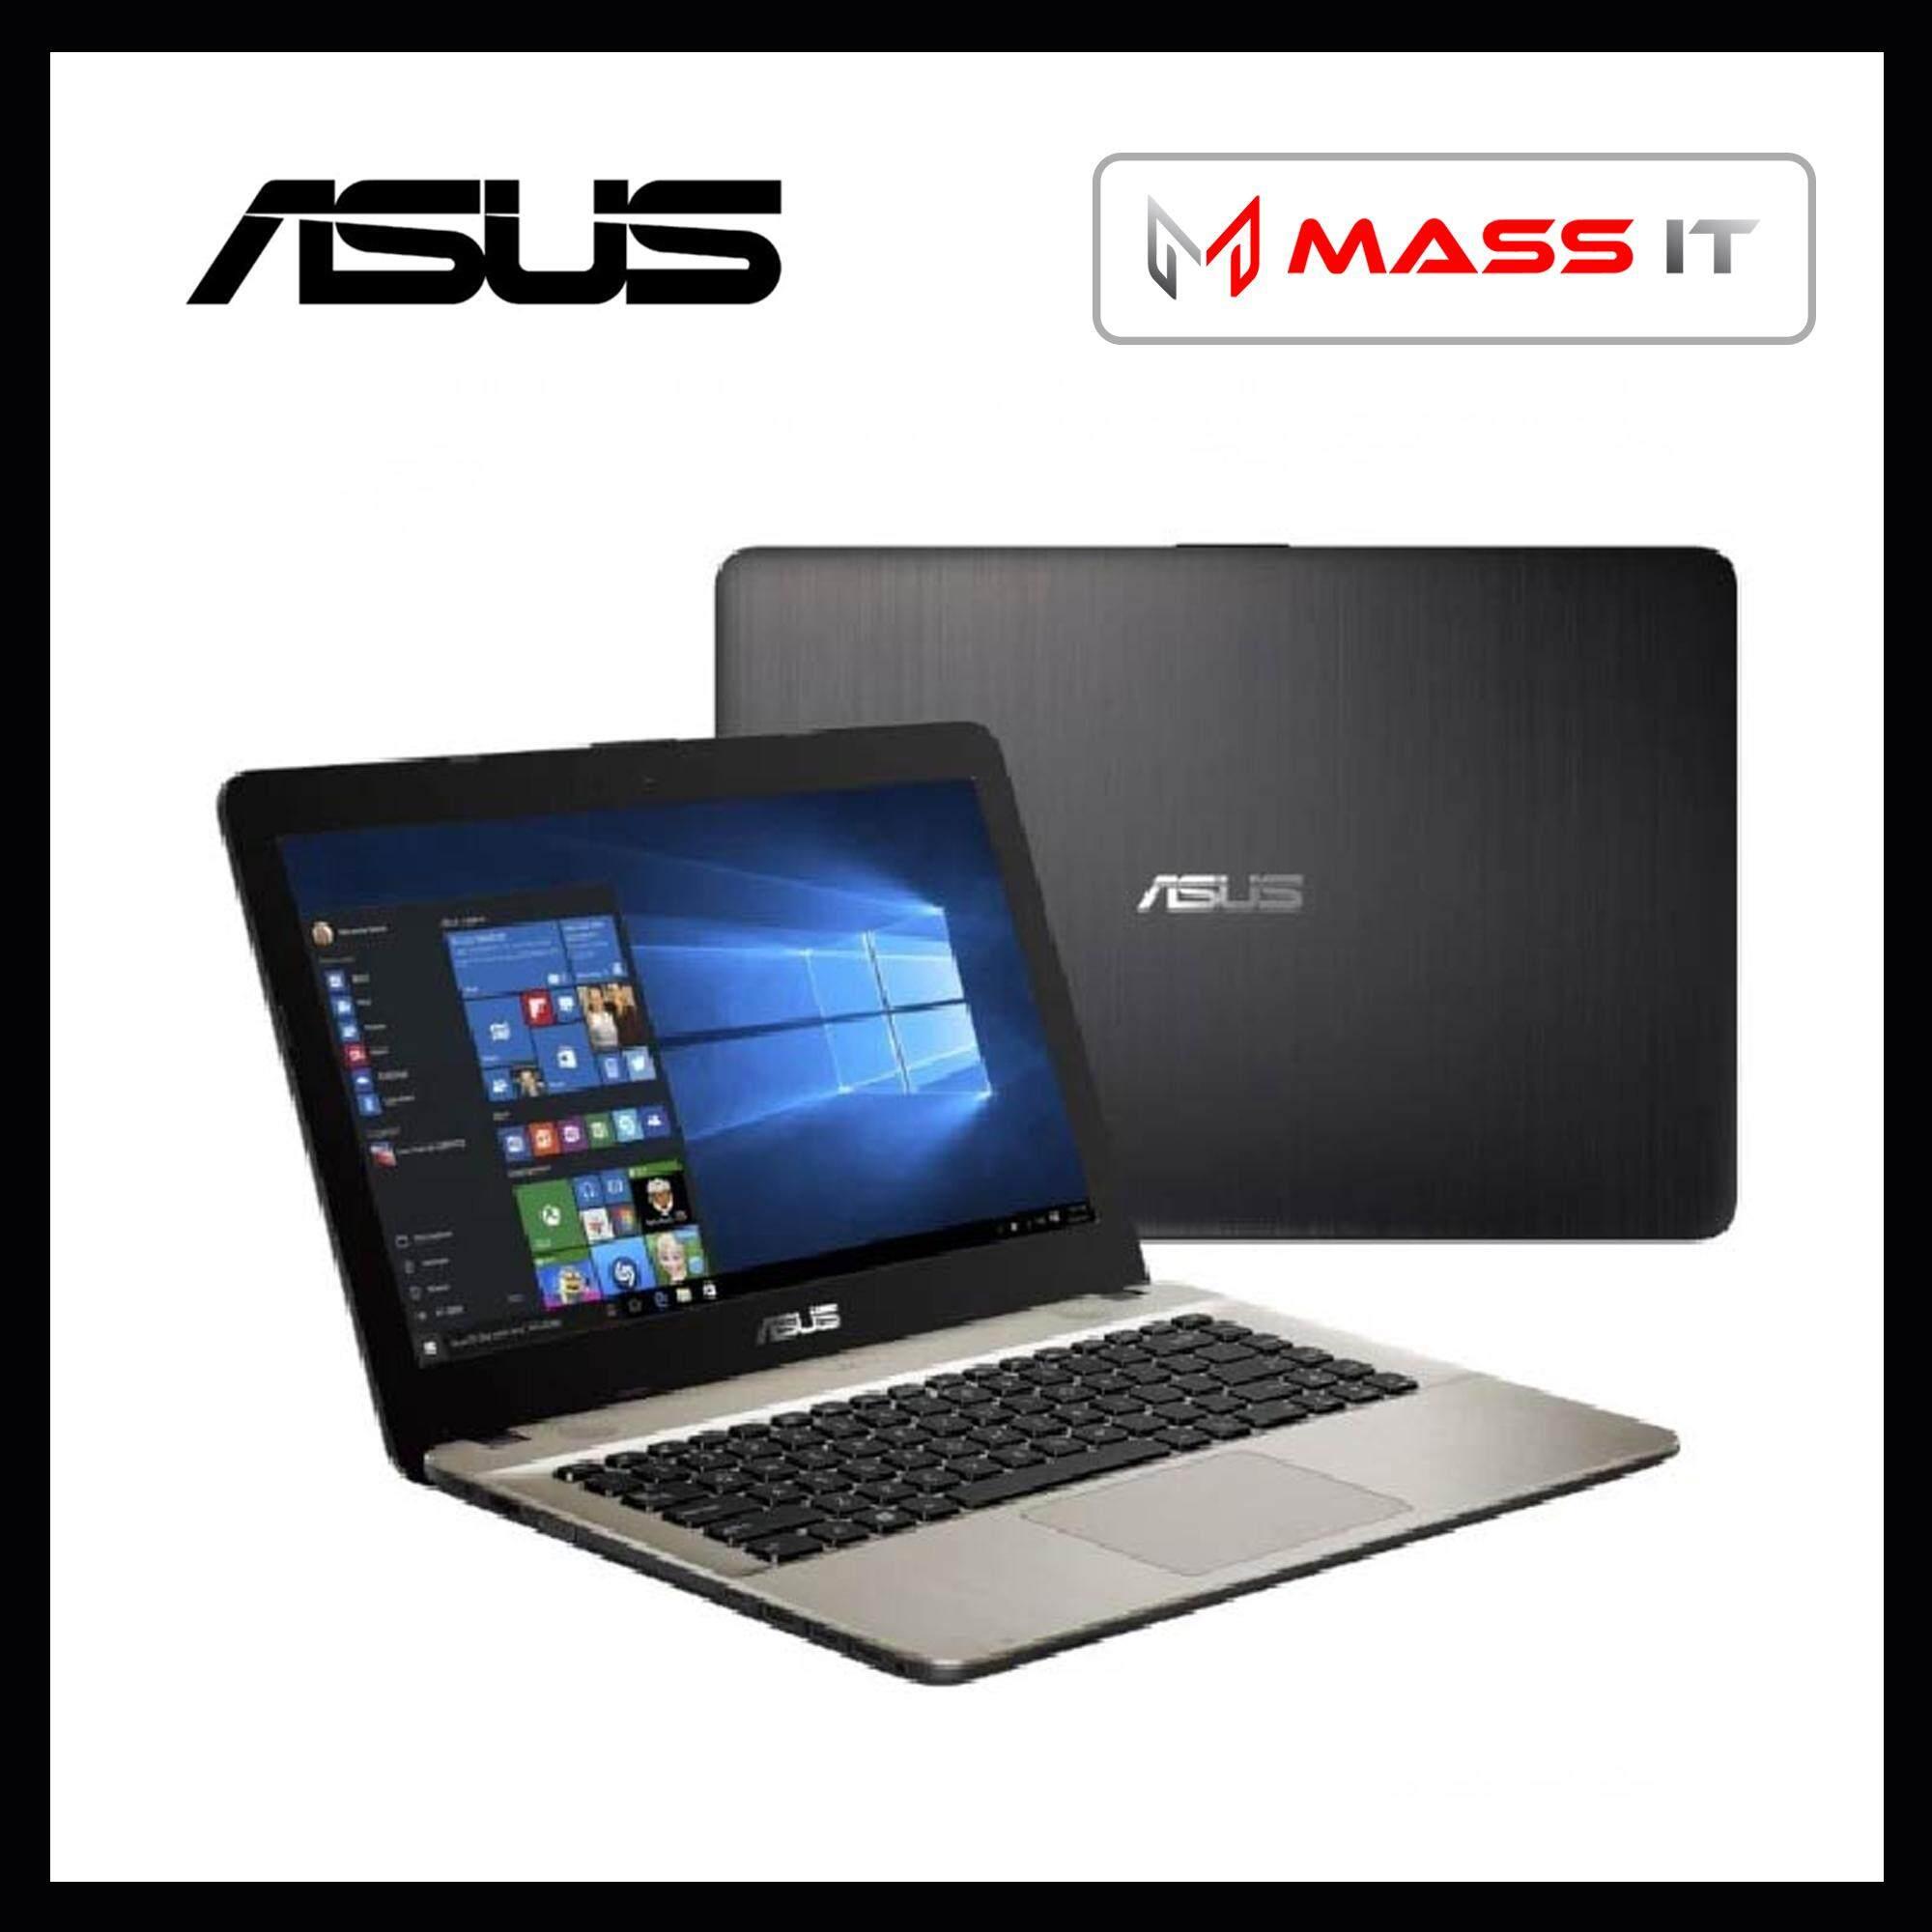 ASUS VivoBook X441U-VWX158T (i3-6006U/GT920MX 2GBD3/4GBD4/1TB/14WIN10/1Year Warranty) Malaysia